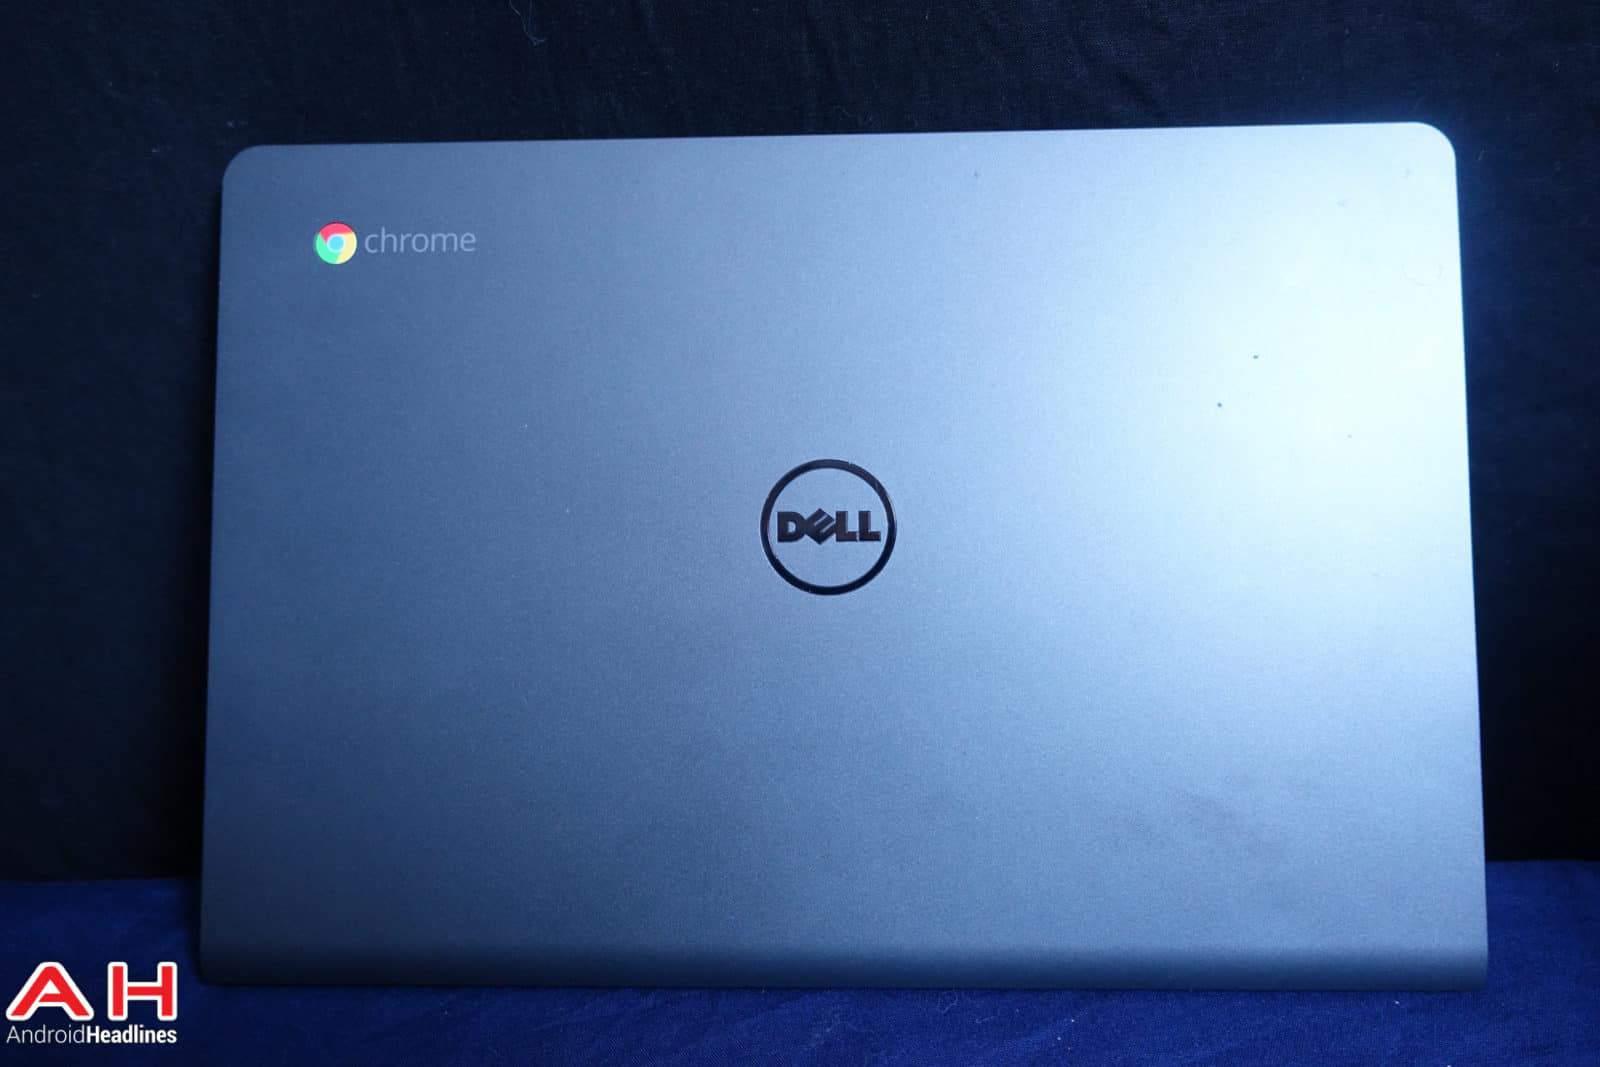 Dell-Chromebook-11-i3-AH-03166